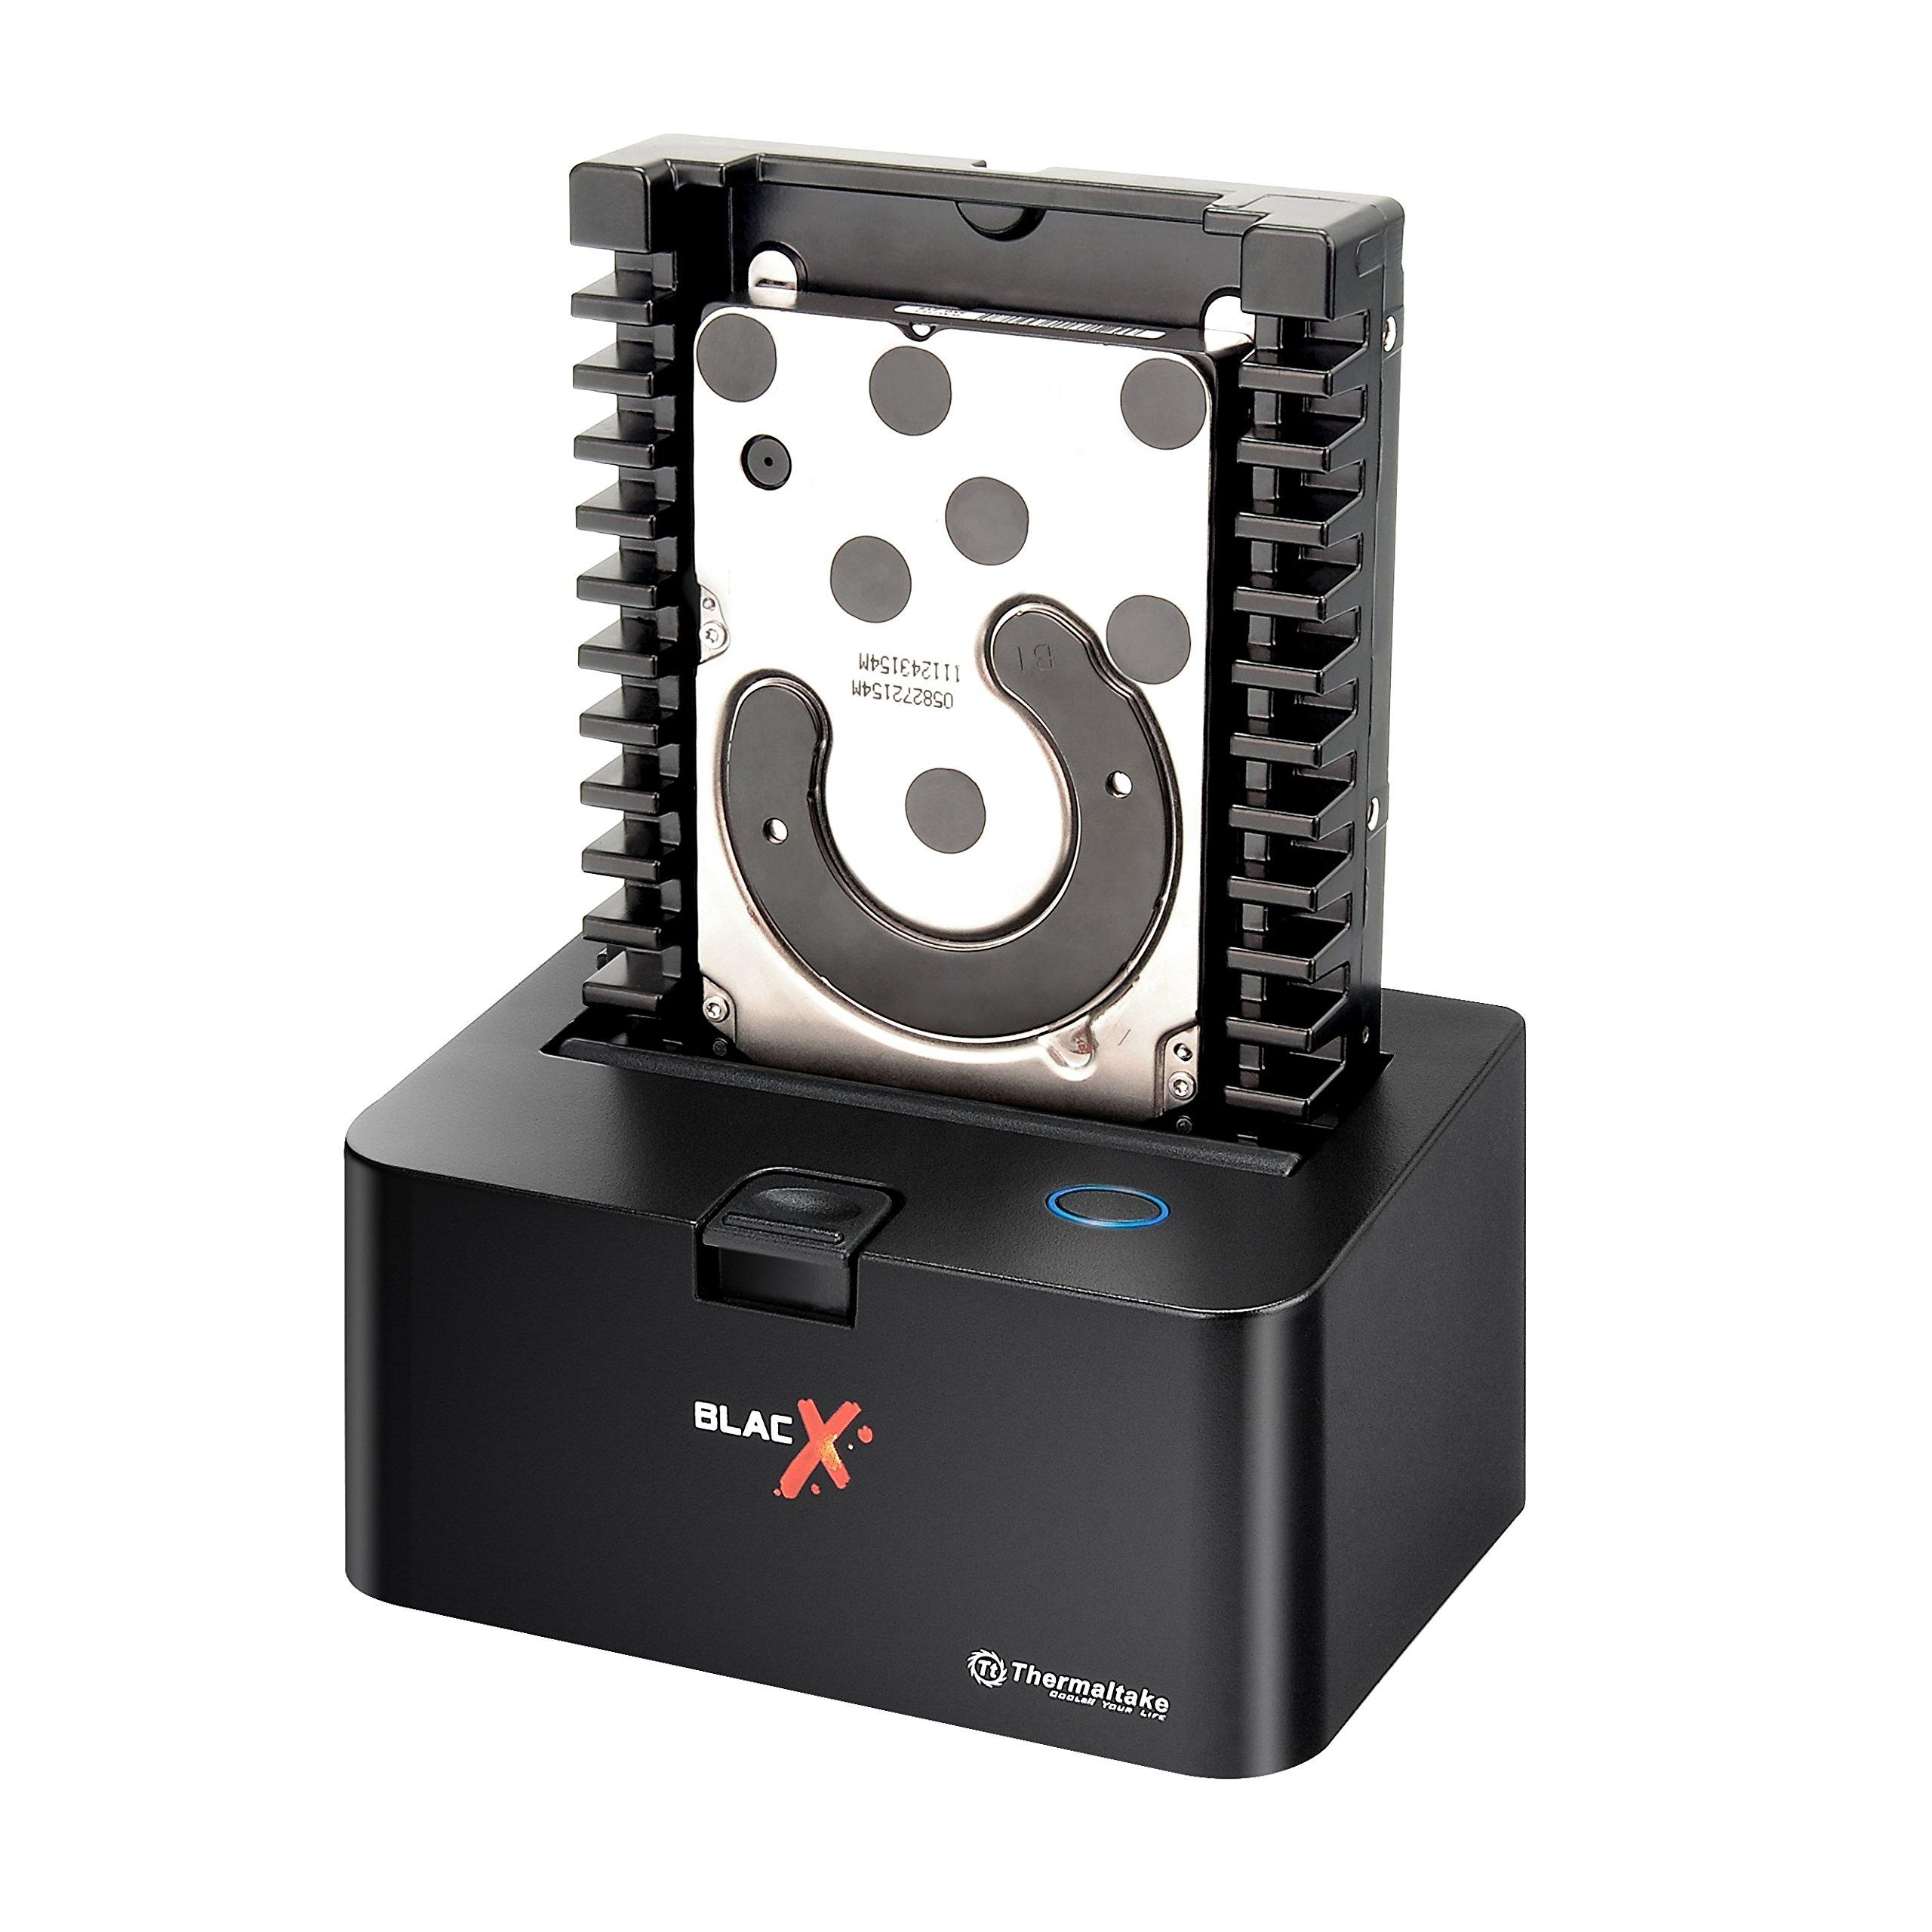 "Thermaltake BlacX 2.5""/3.5"" Sata I/II/III USB 3.0 External Hard Drive Enclosure Docking Station ST0005U-D"